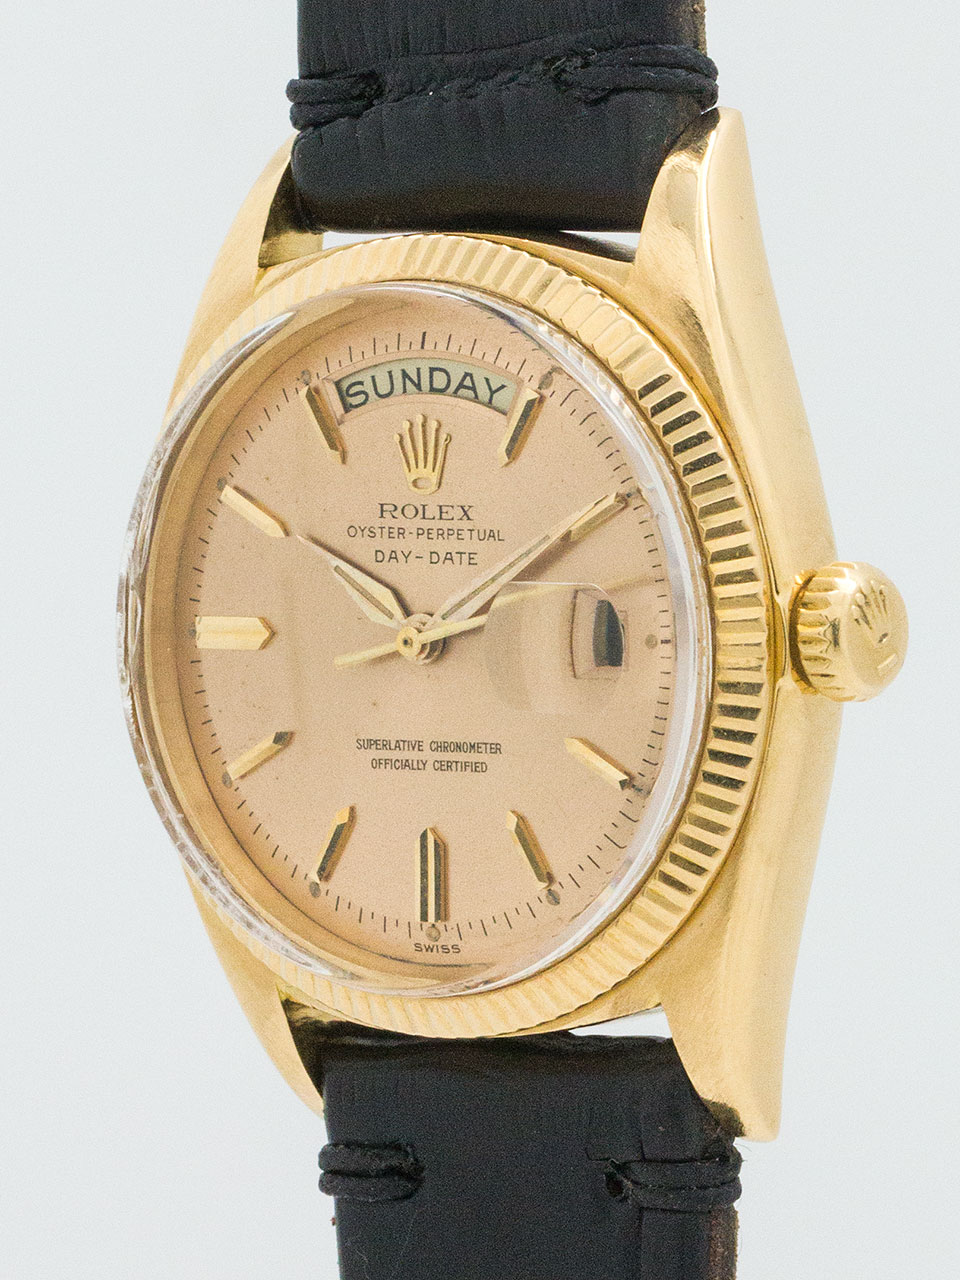 Rolex Day Date President ref 1803 Rose Dial circa 1968